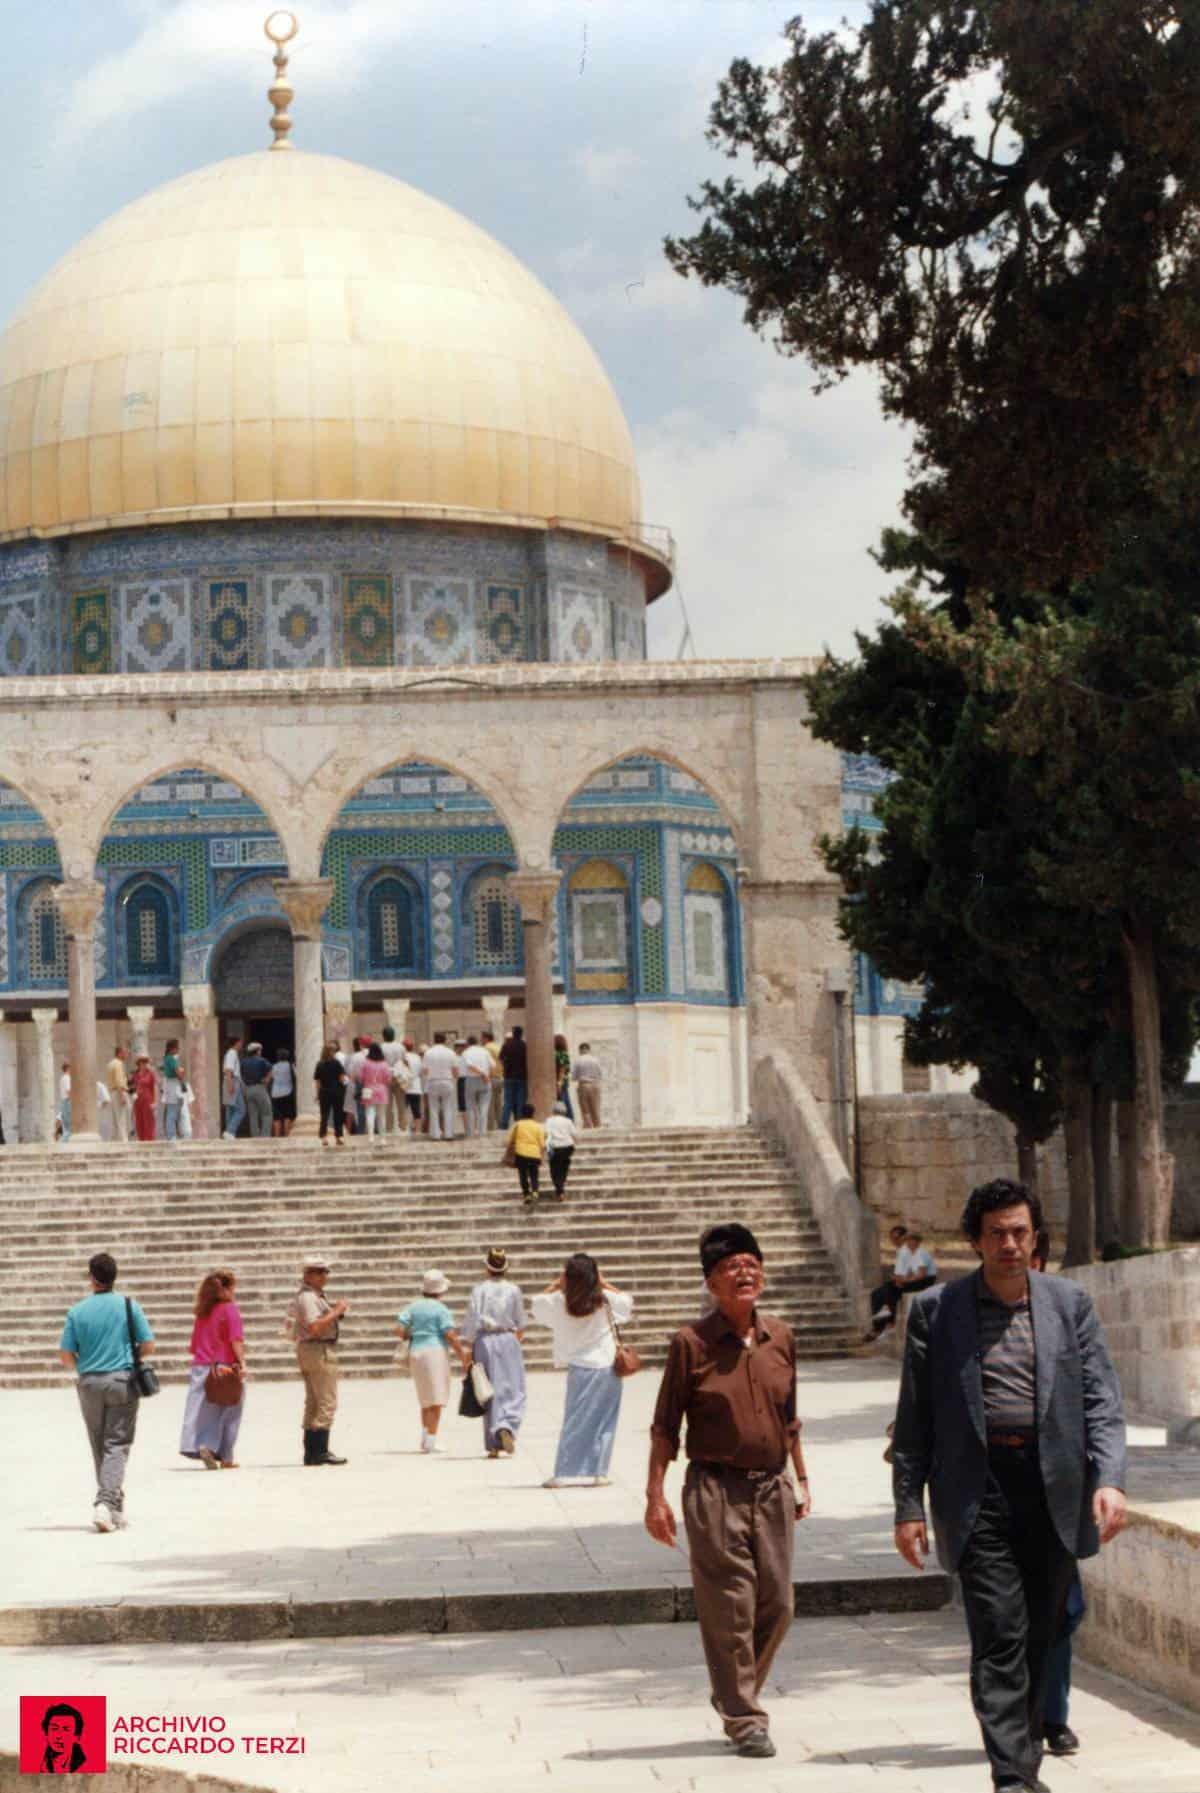 Gerusalemme, Cupola della Roccia (1991)